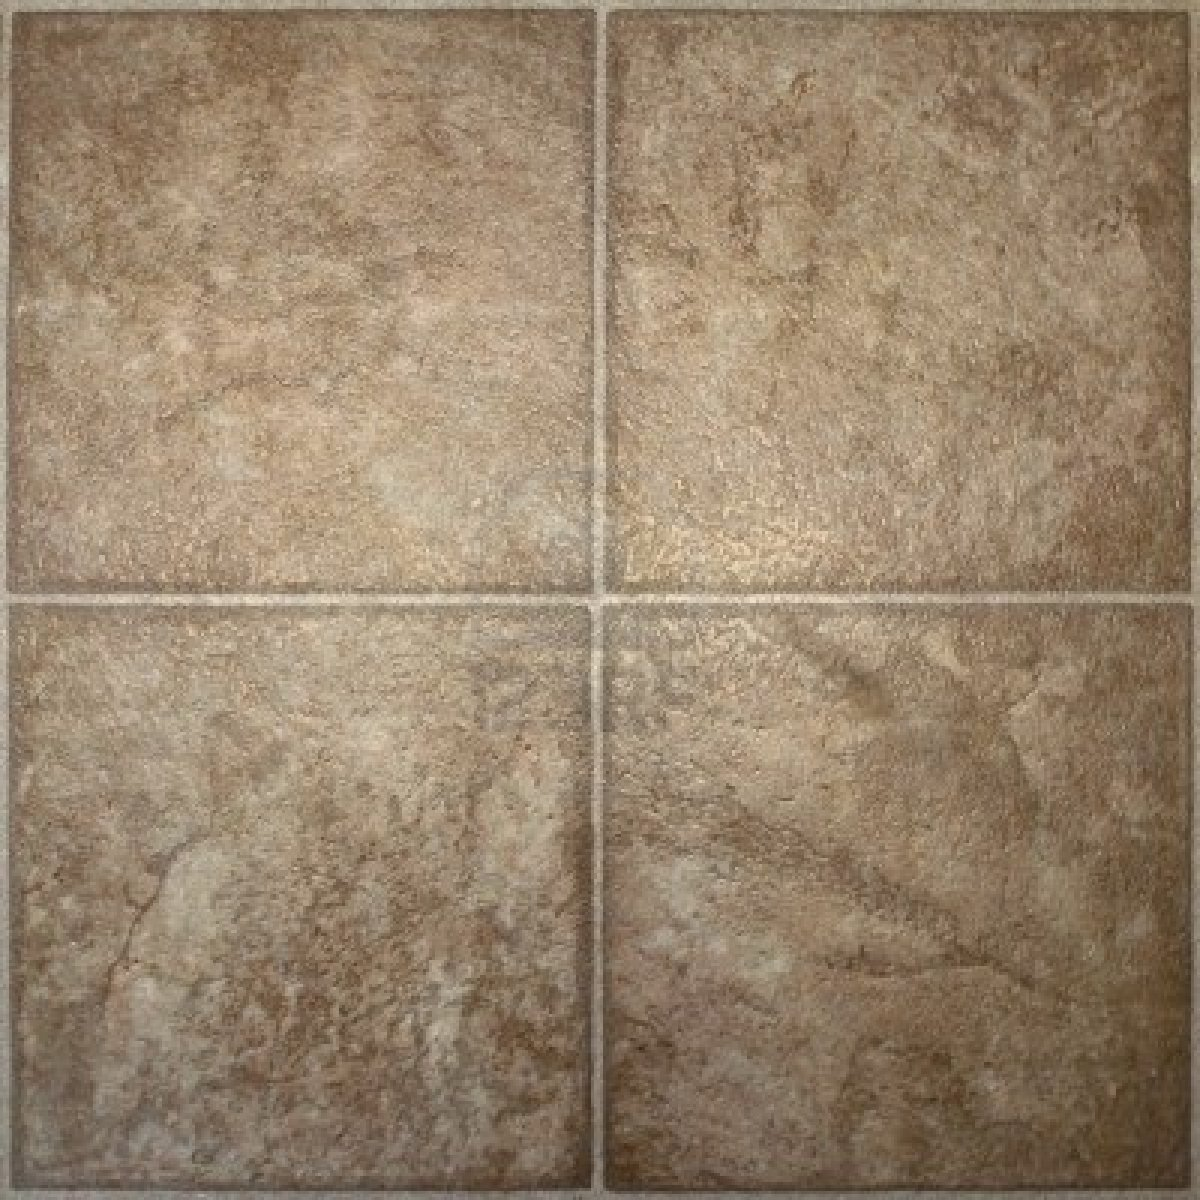 Modern Kitchen Floor Tiles Texture tile linoleum | carpetcleaningvirginia